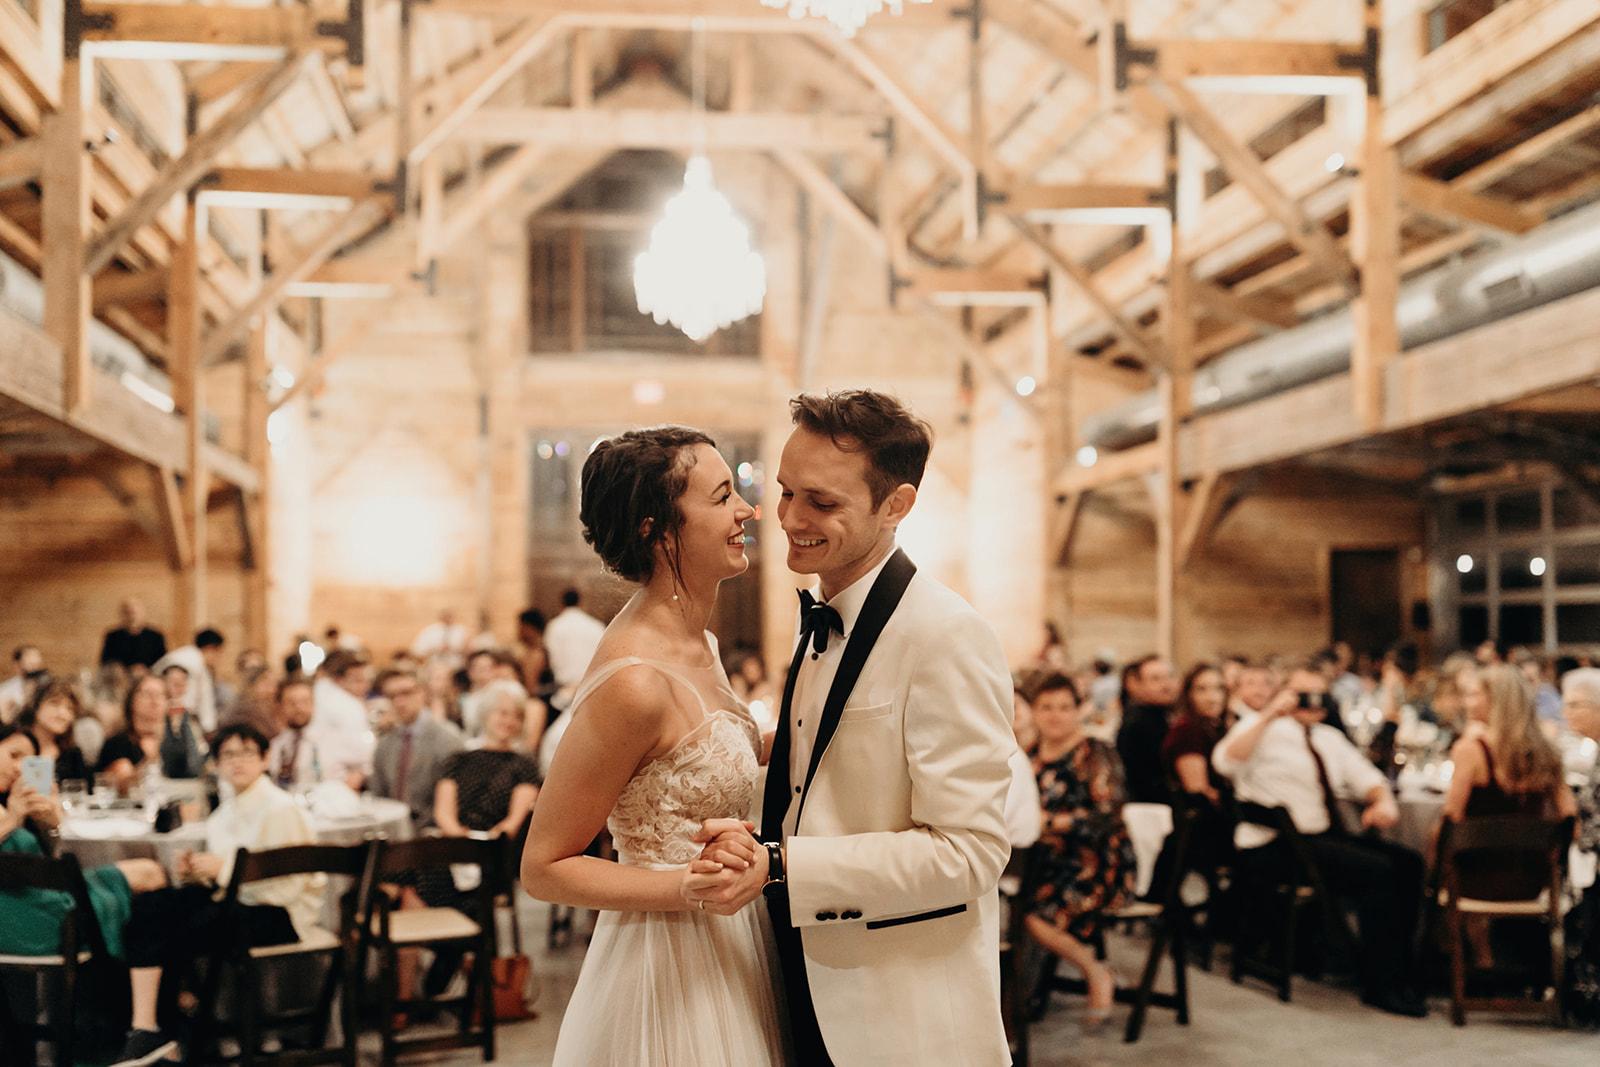 austin-wedding-lindsey-bryce-769.jpg